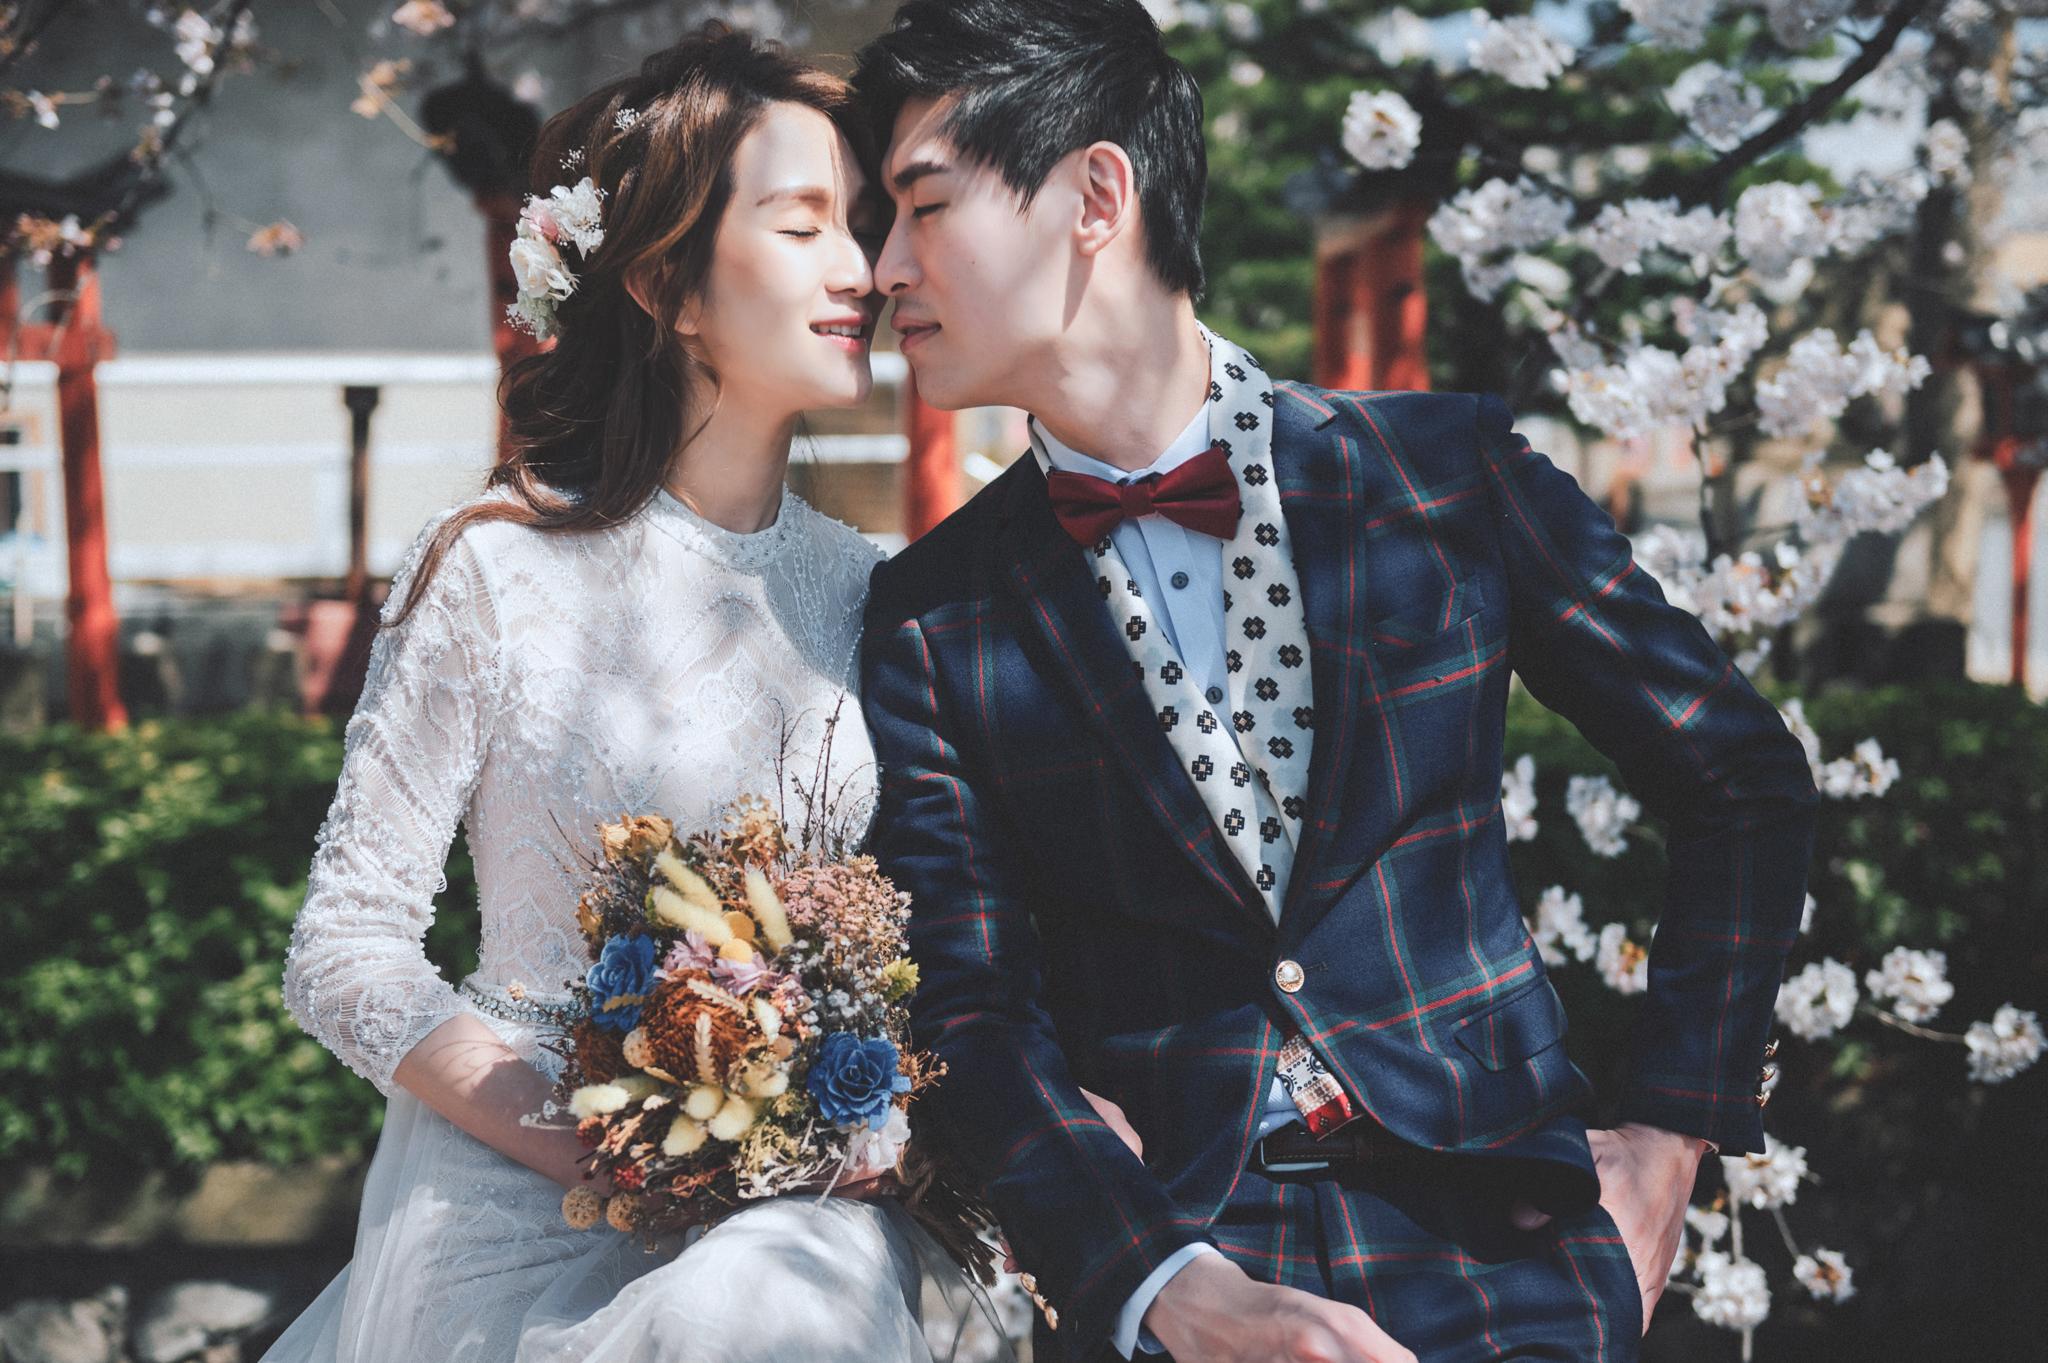 Easternwedding 婚禮影像工作室 EW JMH 居米 日本 京都 櫻花 婚紗